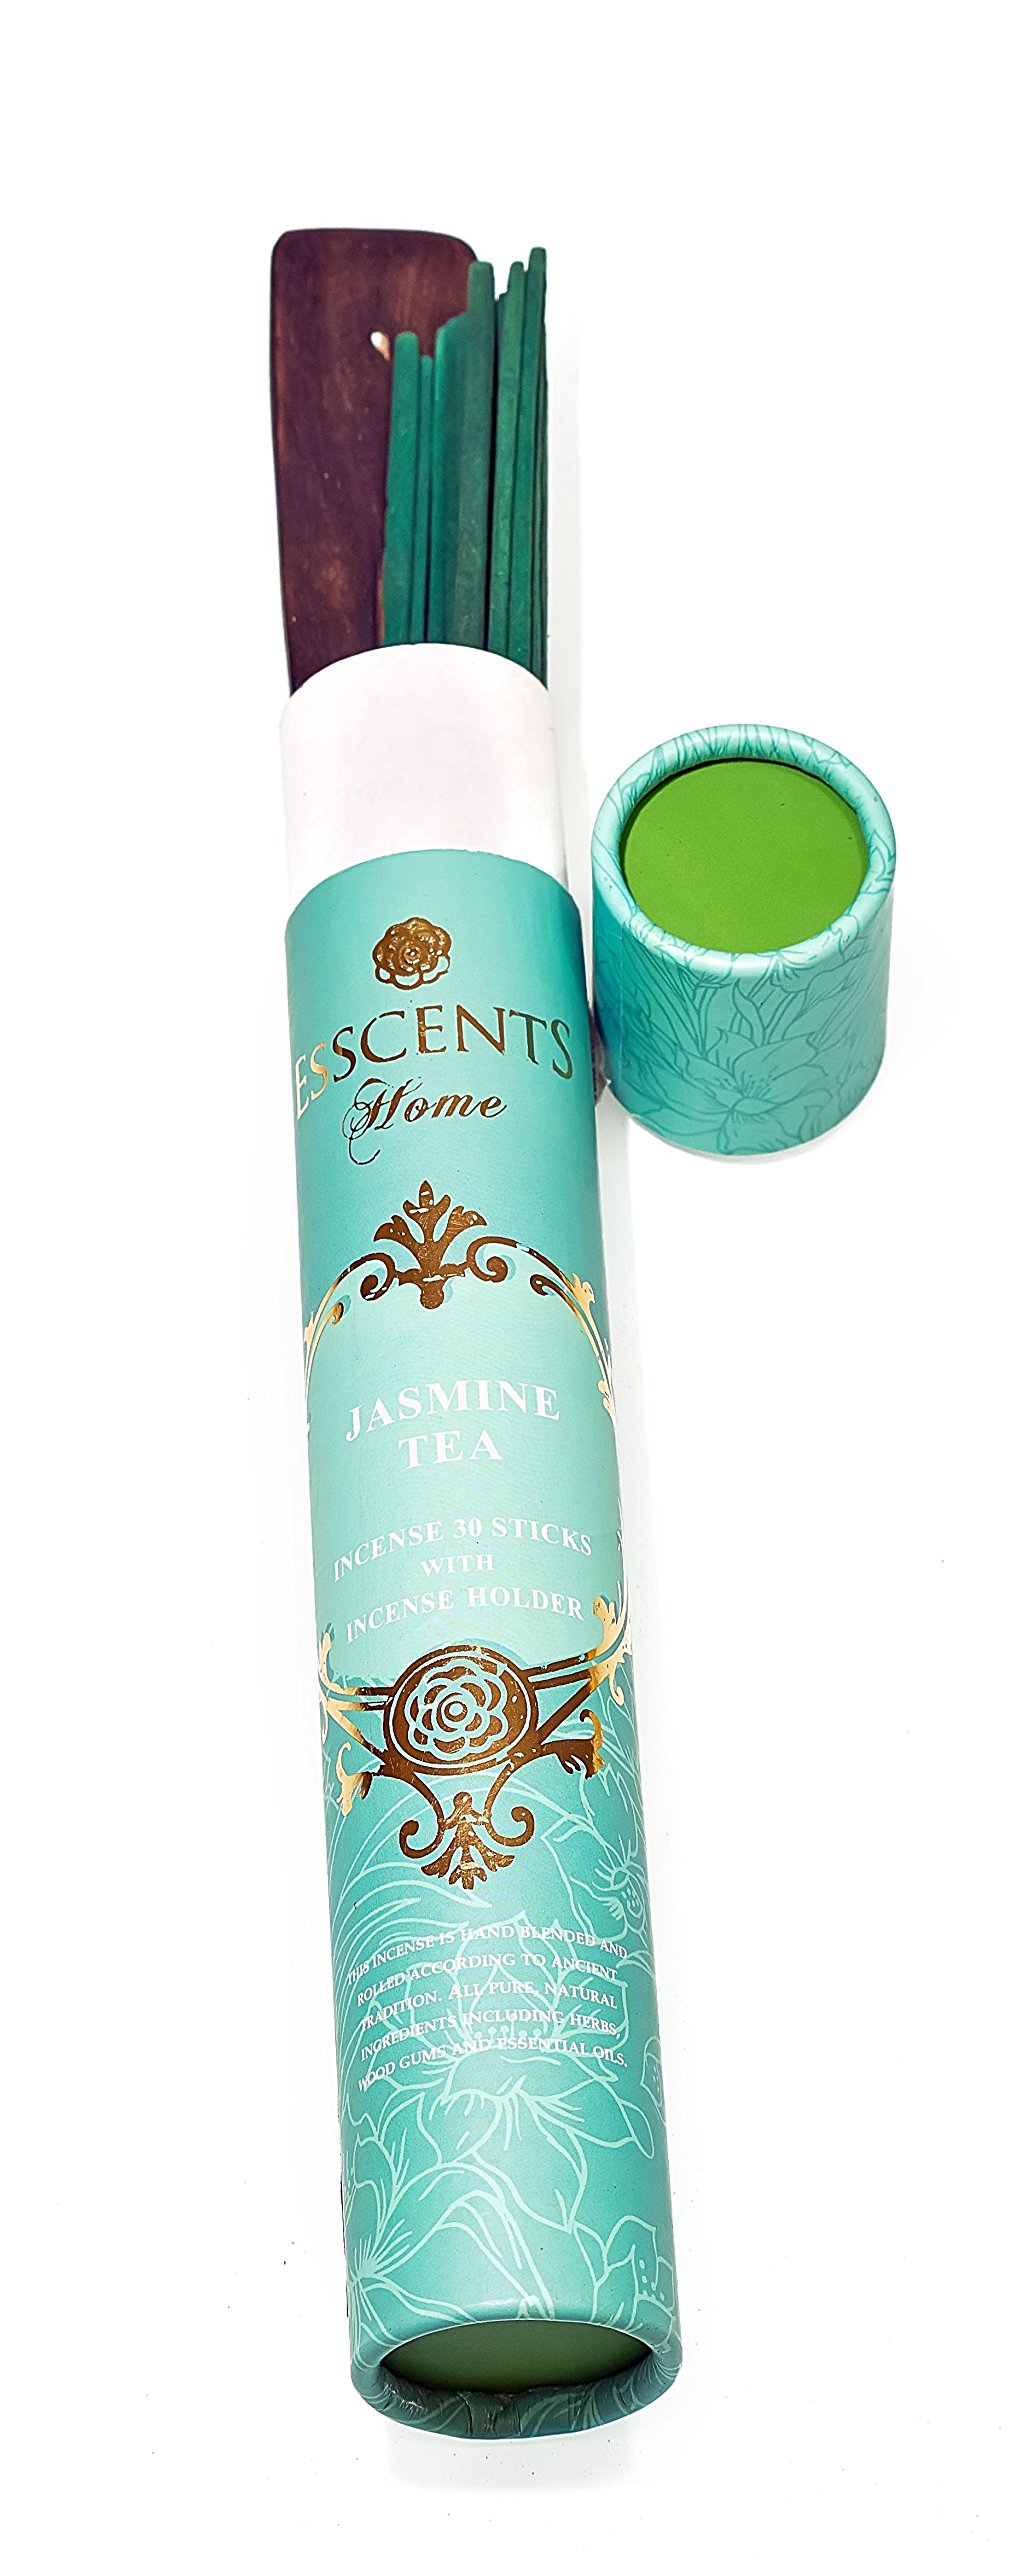 Essence incense gift pack 180 sticks with incense holder 6 flavors, Ocean,Morning Blosom,Jasmine tea,Rose Geranium,Sandalwood spice, And Lavender Rosemary. by Essence (Image #4)